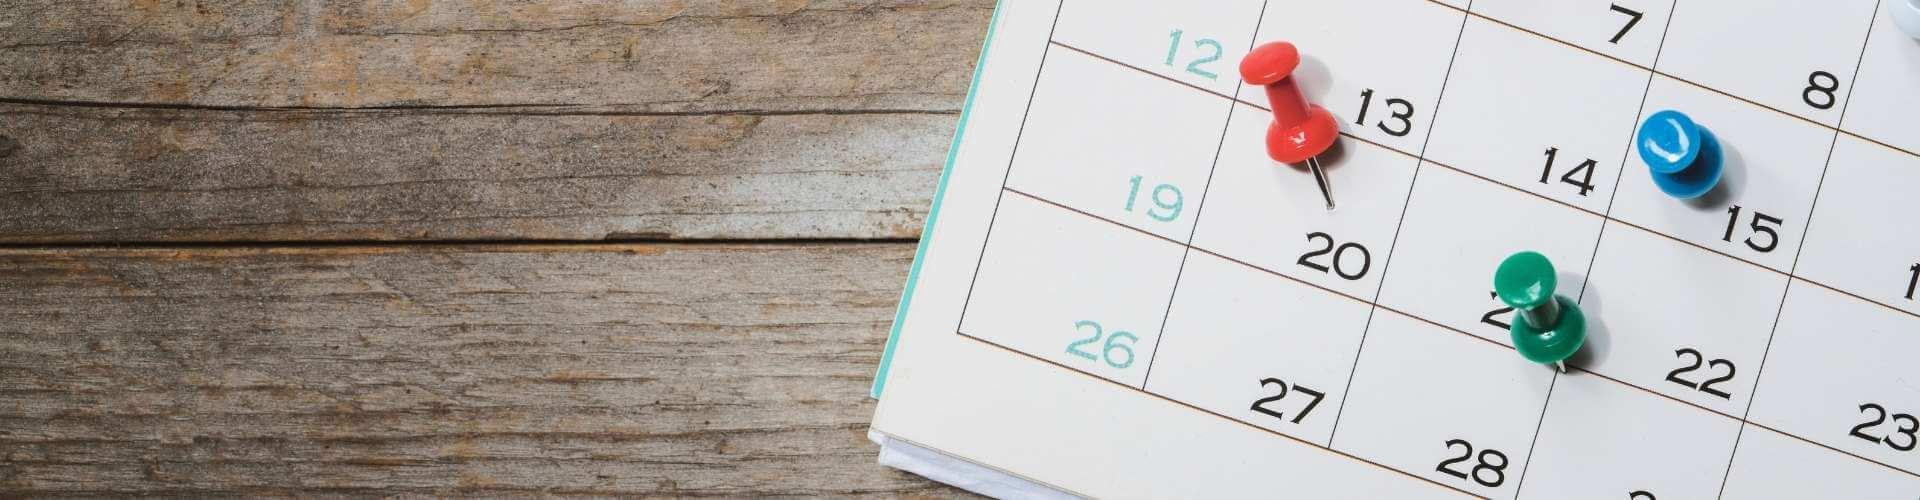 calendario test di ammissione universitari